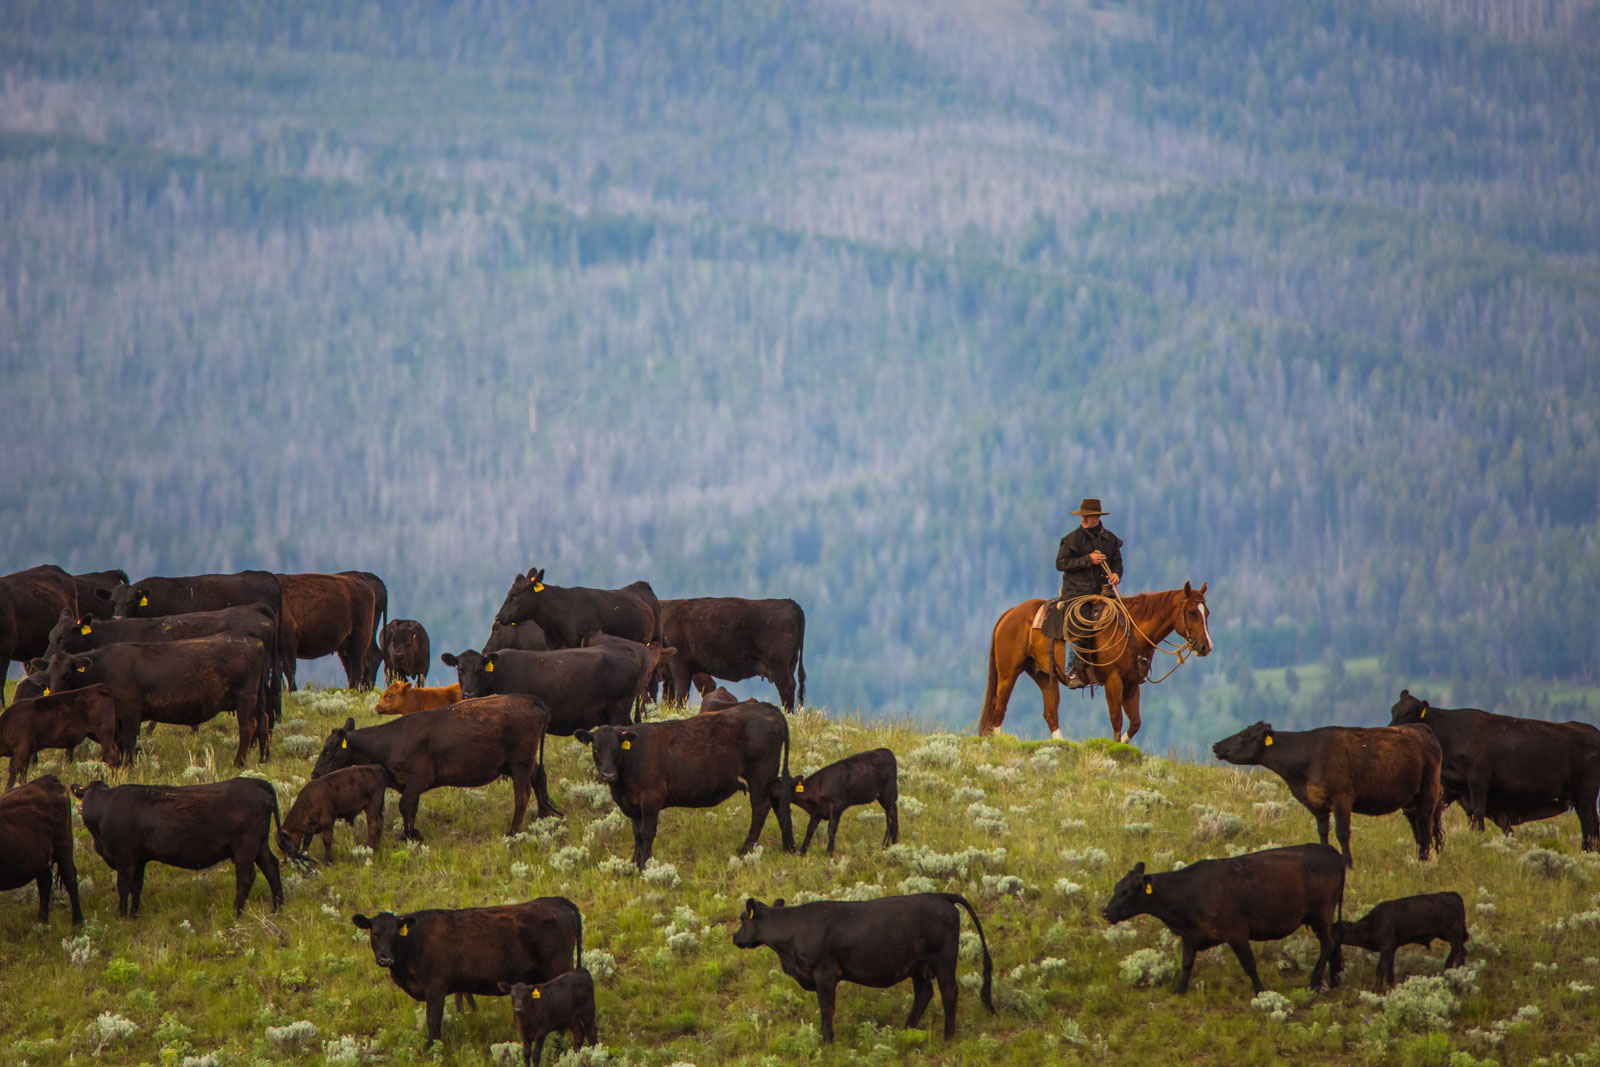 Ranch life, J Bar L Ranch. Montana, USA